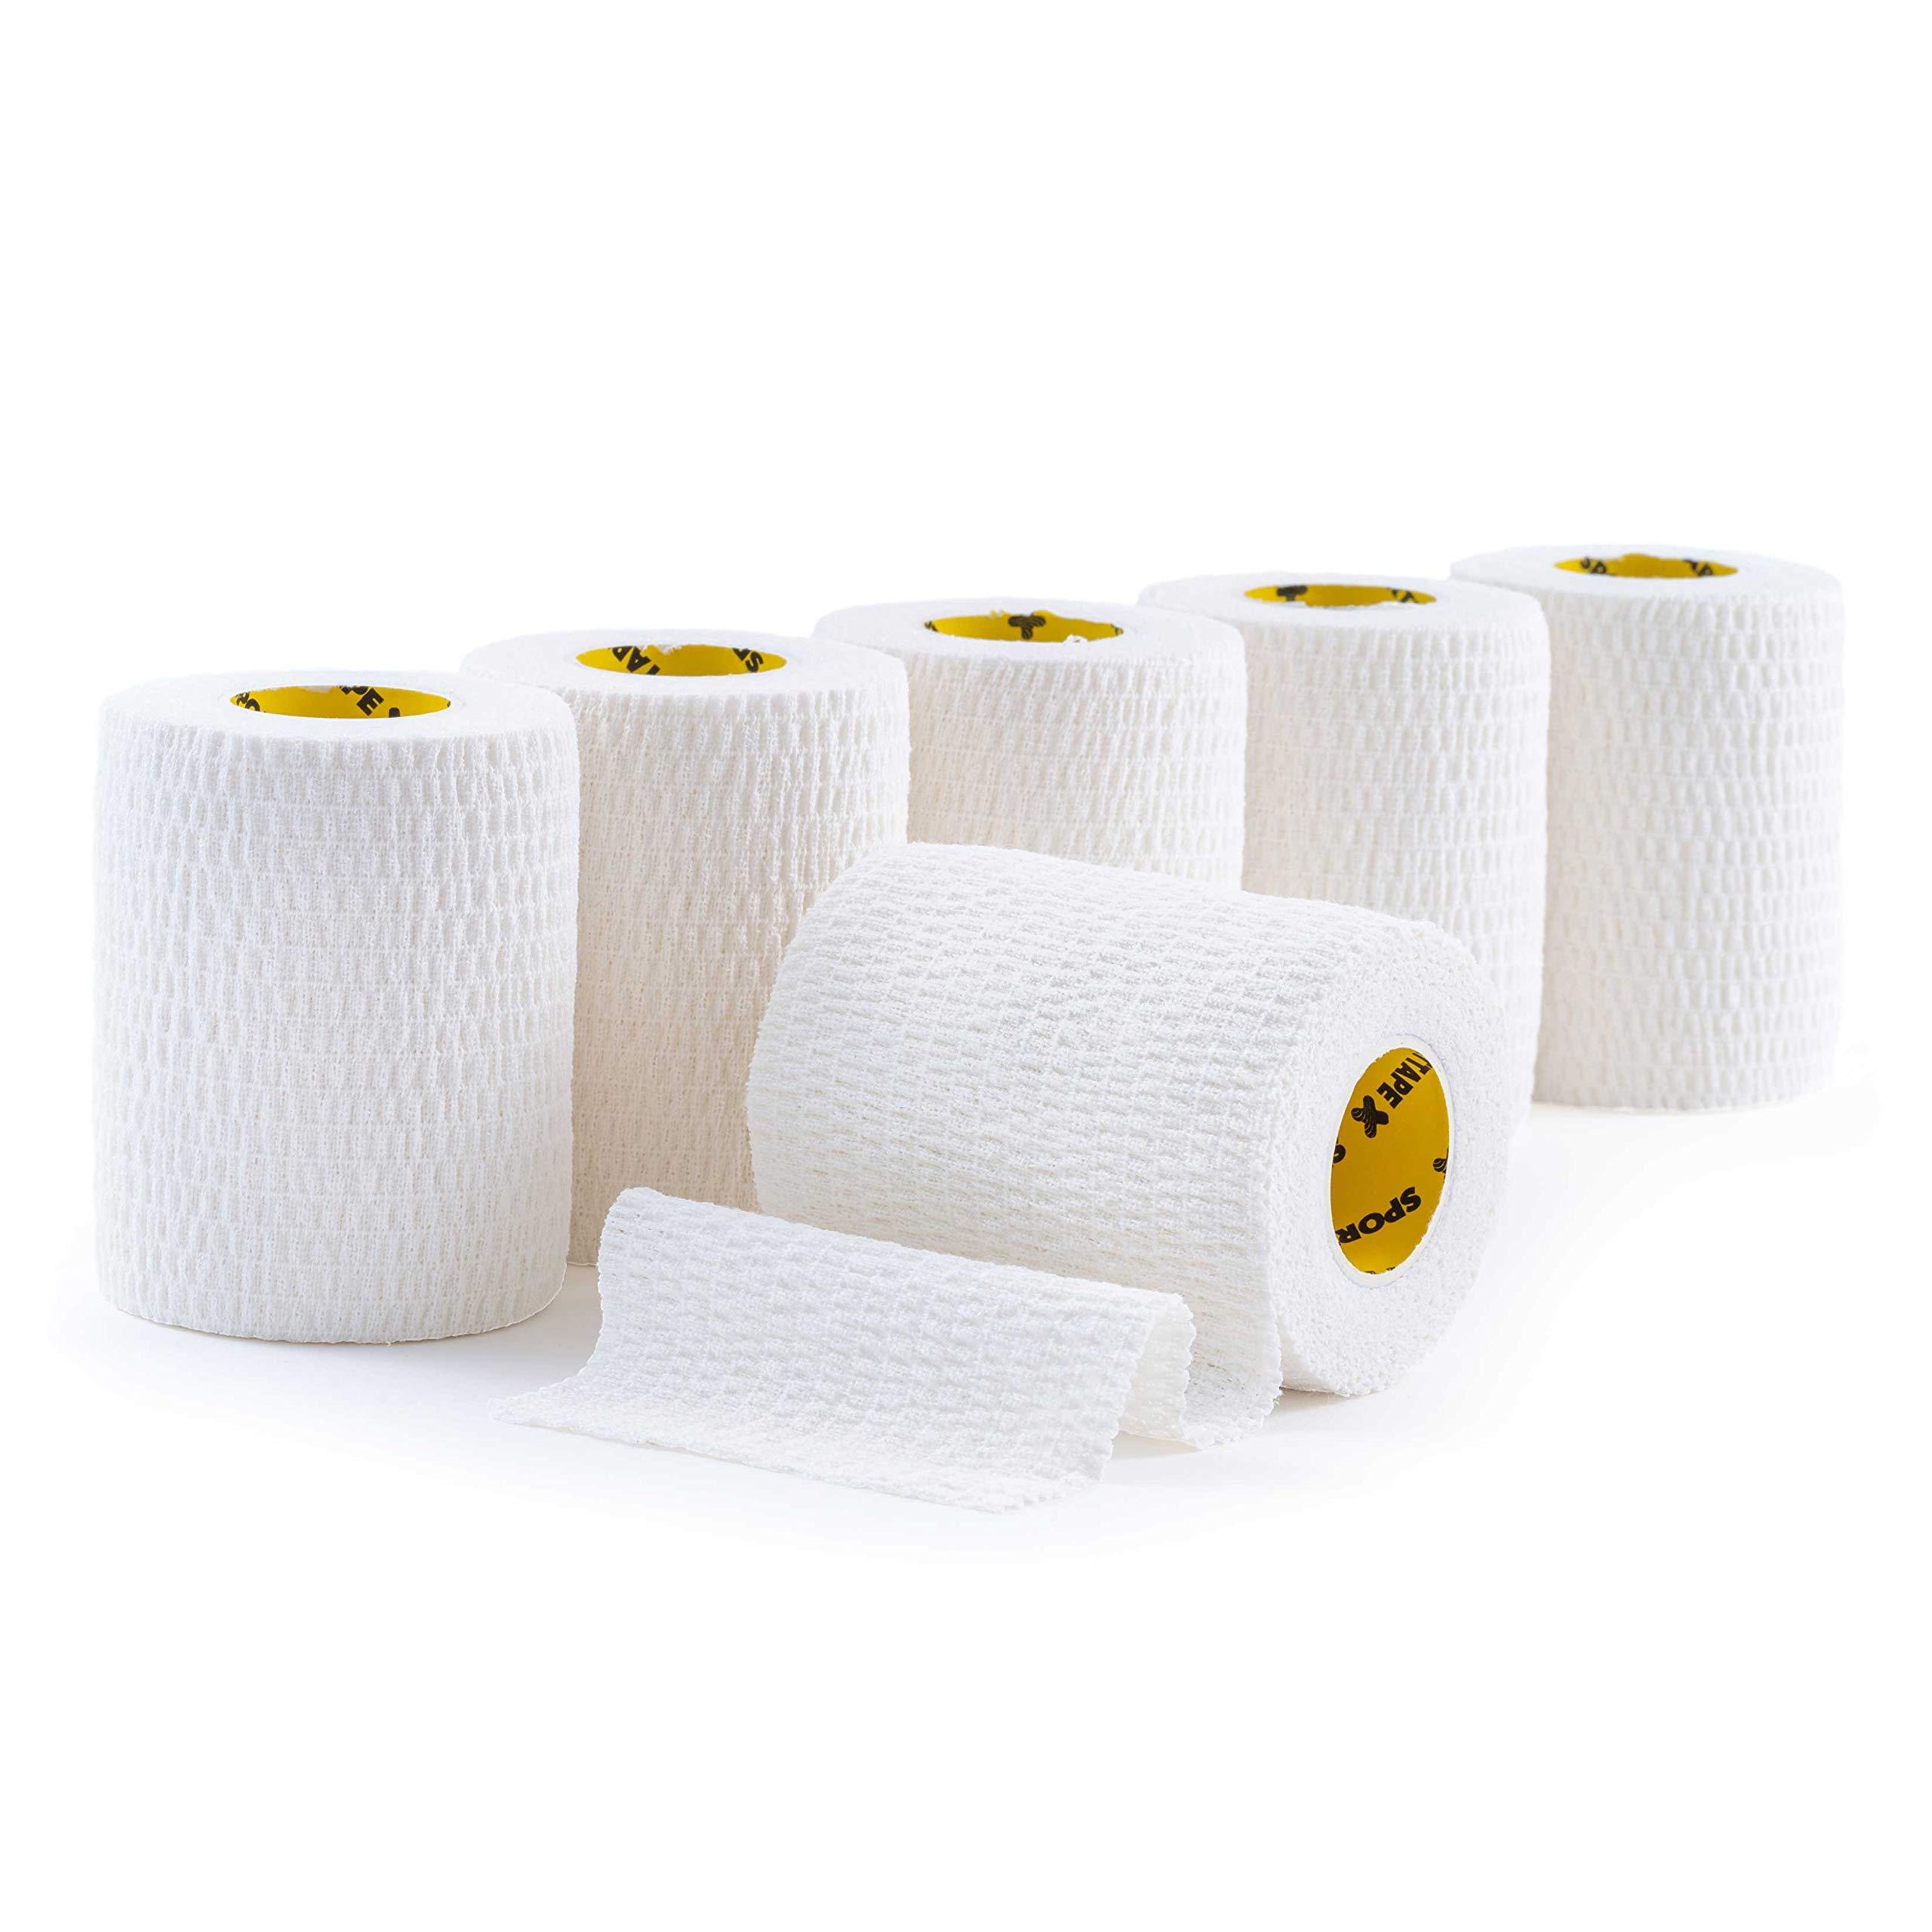 6 Rolls - SPORTTAPE Tear EAB - White - 7.5cm x 4.5m - Rugby Lifting Tape, Elastic Adhesive Bandage Sports Strapping Tape, Tear Light EAB, Lifting Tape